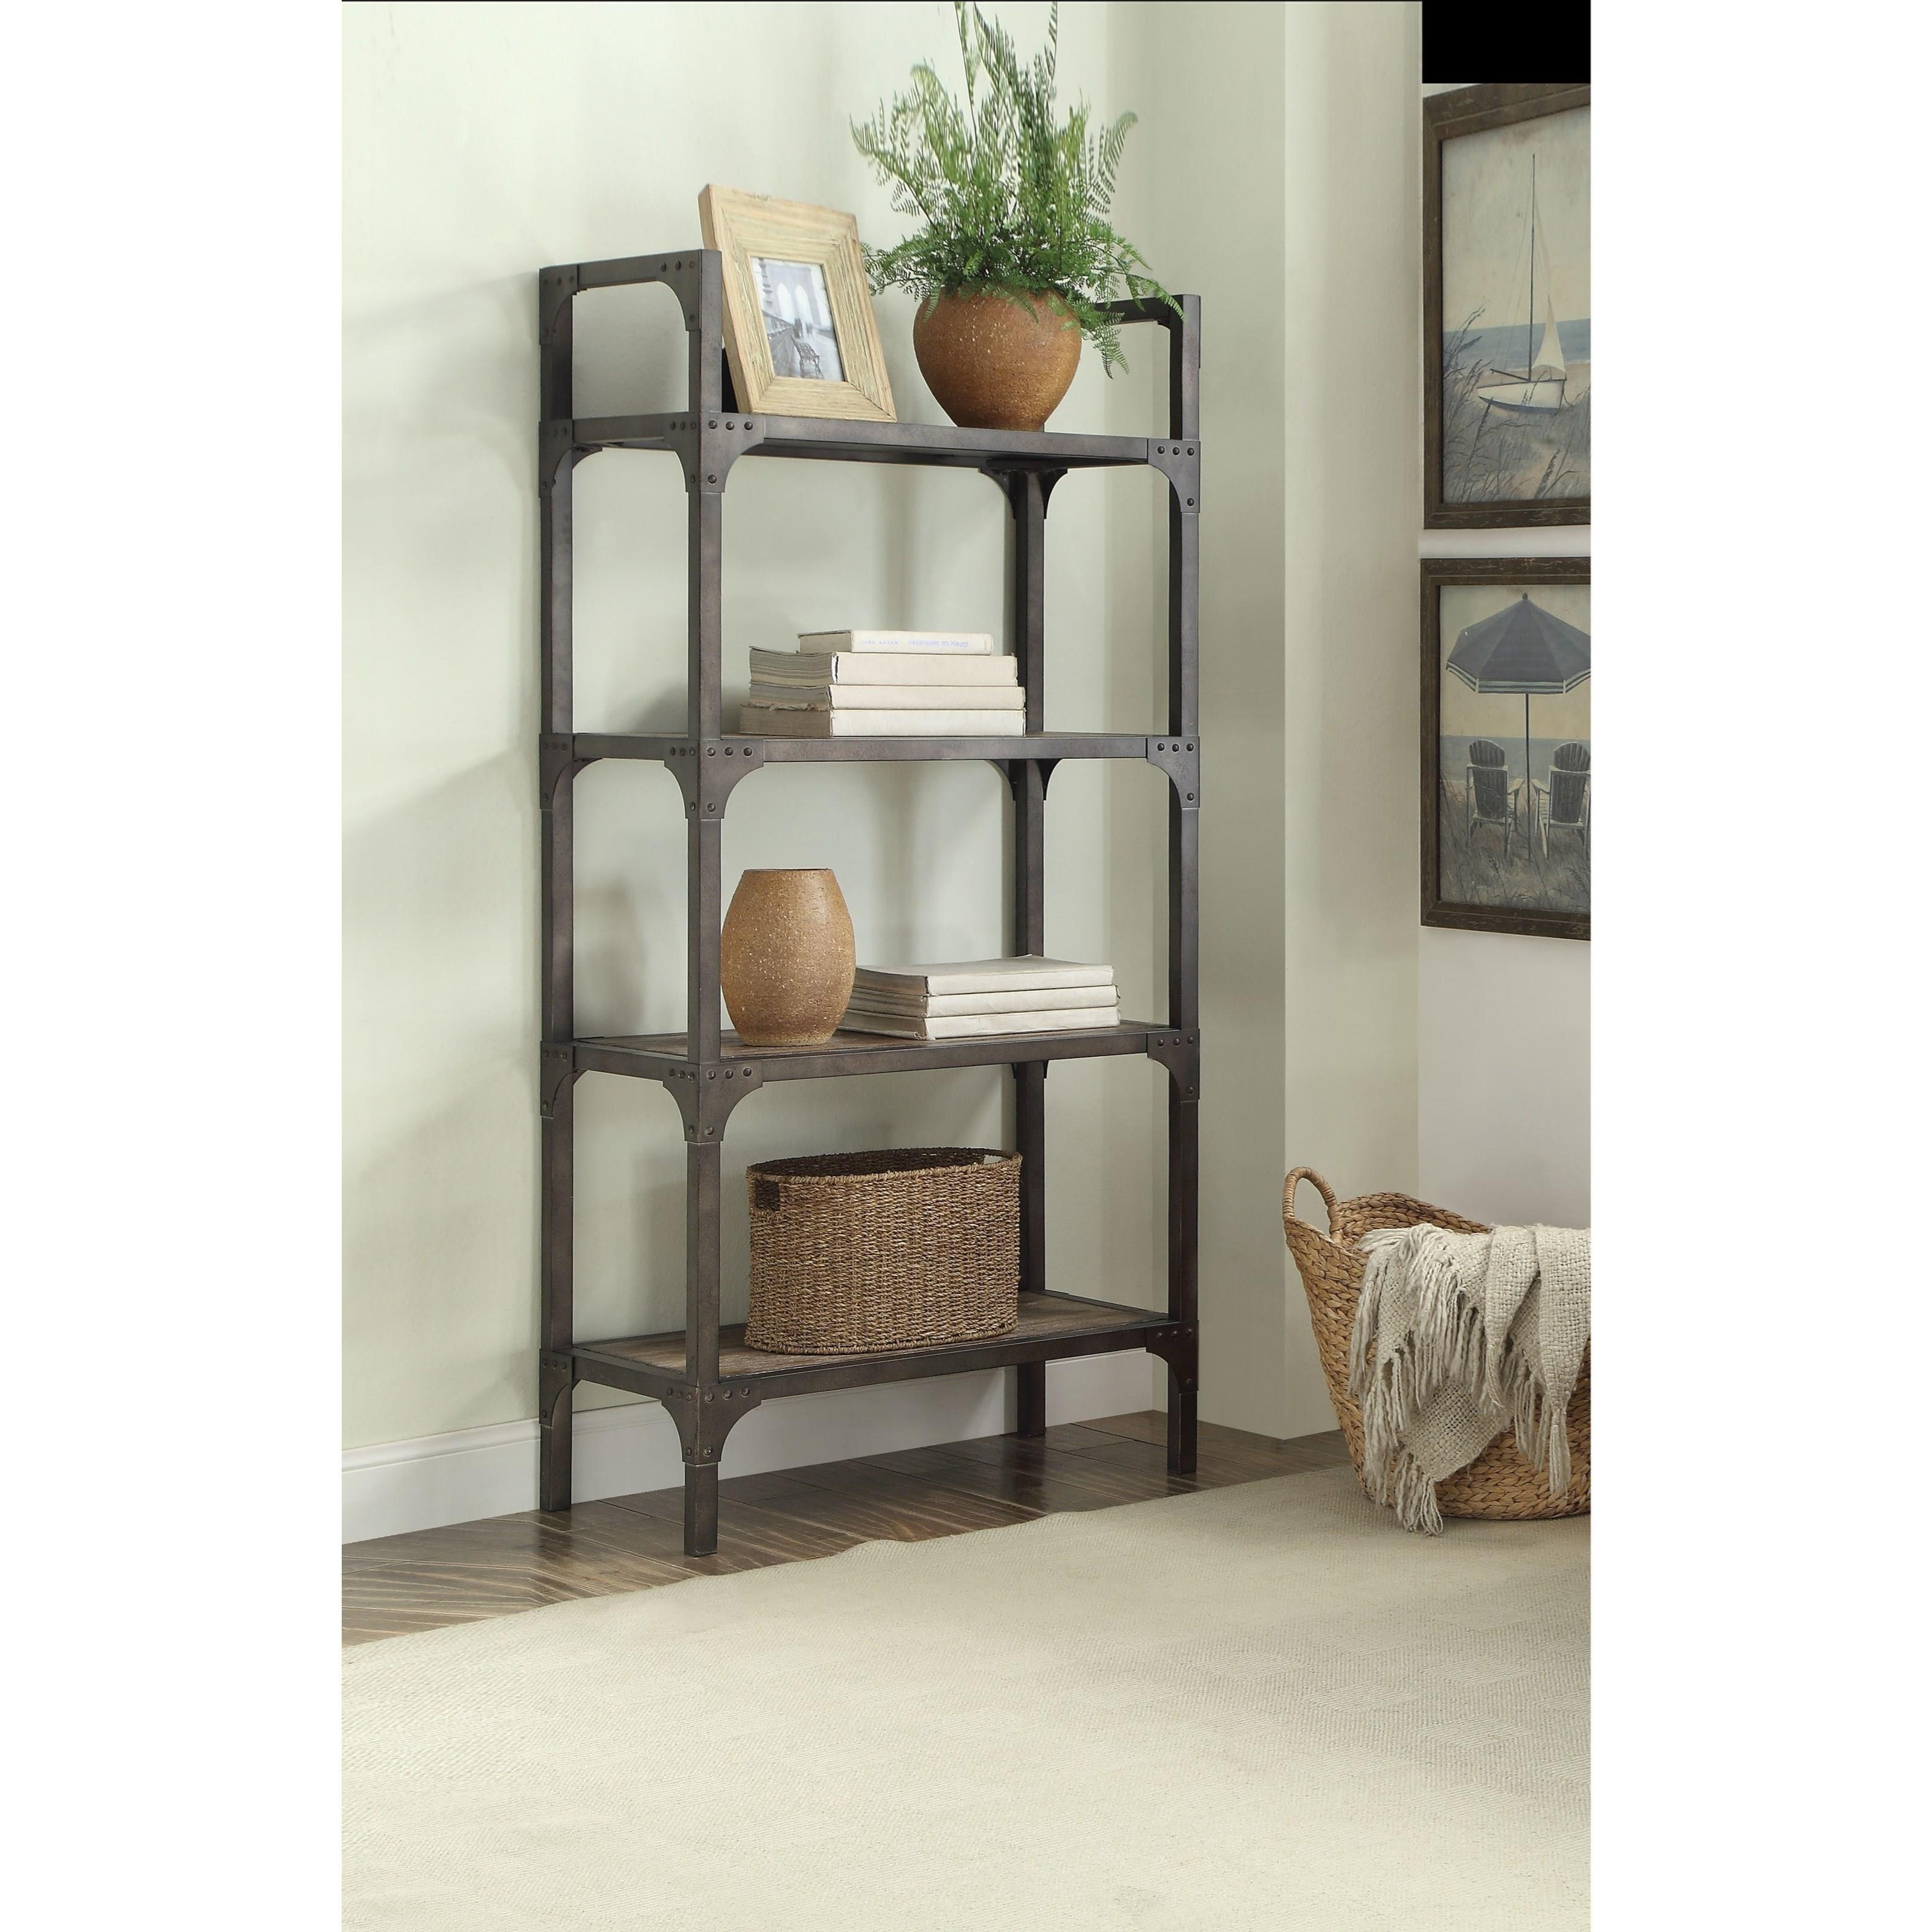 Gorden Bookshelf by Acme Furniture at Carolina Direct